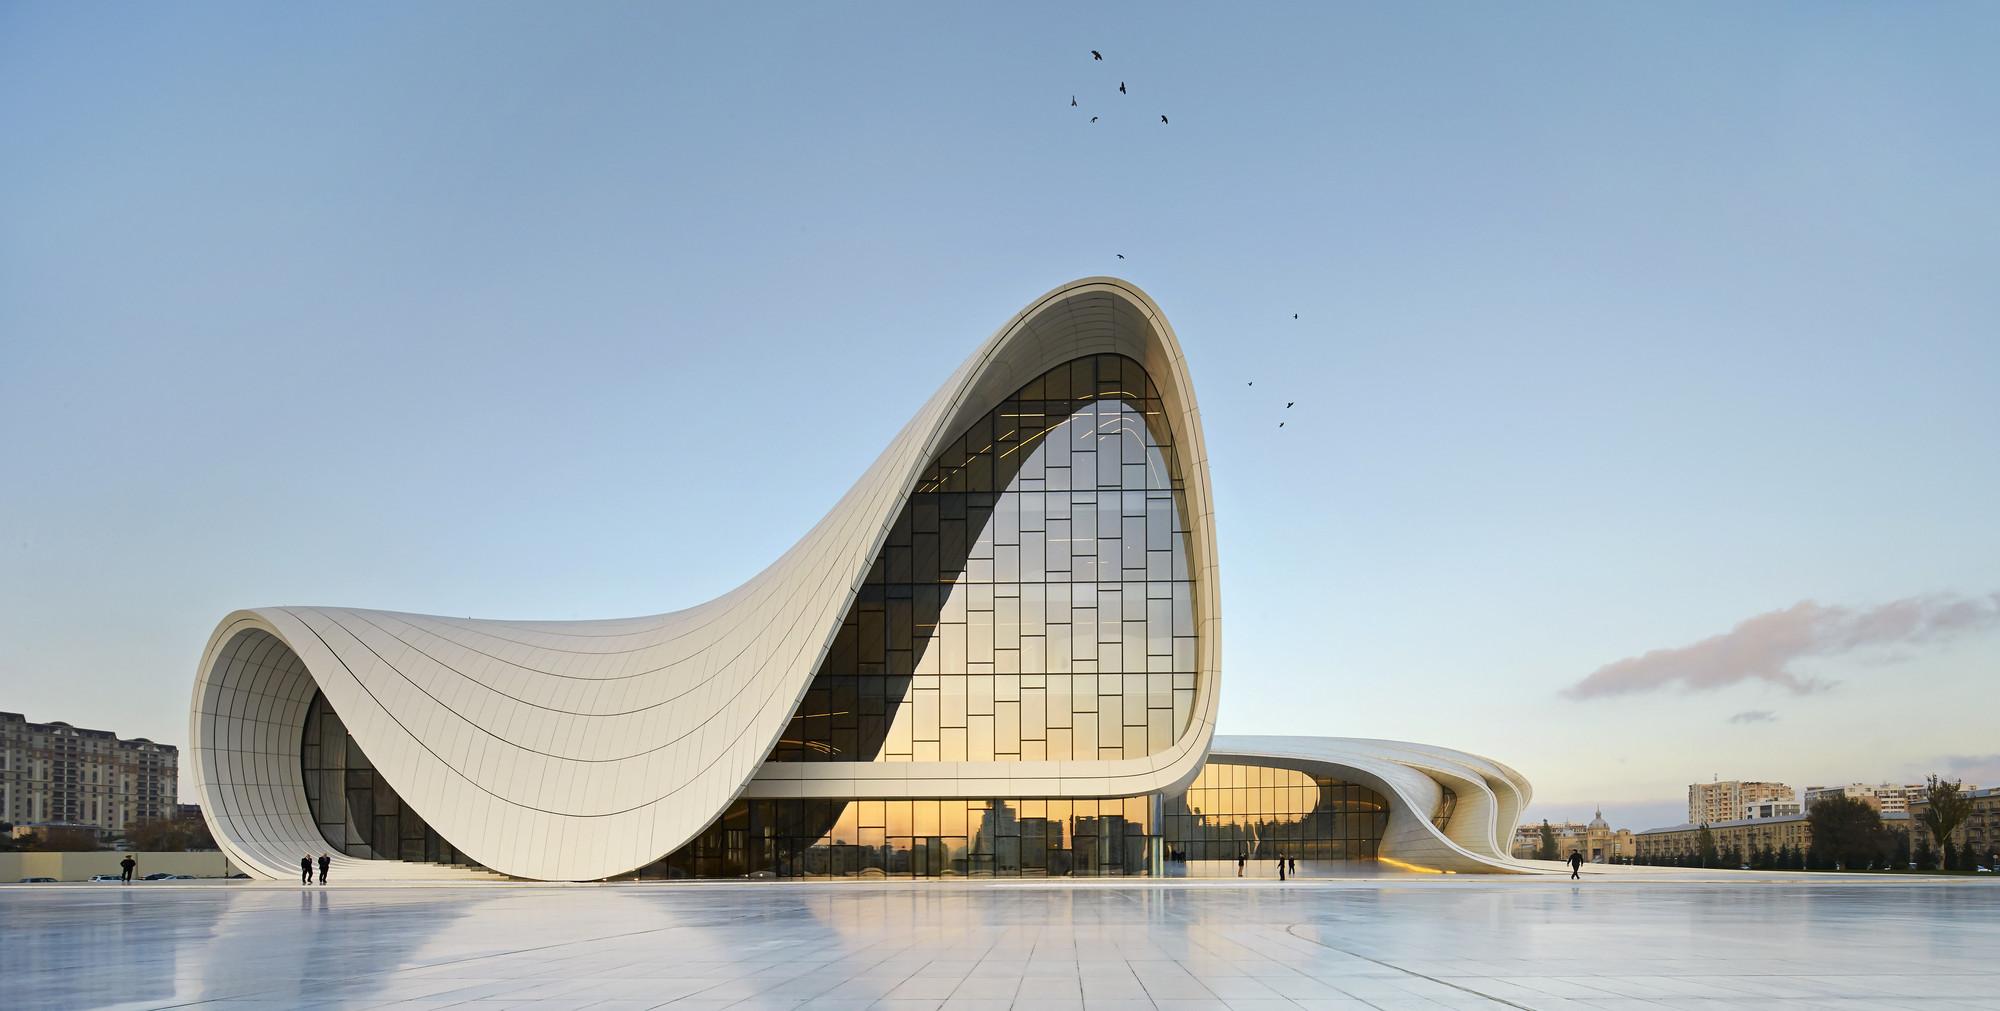 HAC Exterior Photo by Hufton Crow (1) - 5 Tempat Menarik yang Dapat Anda Kunjungi di Negara Api Azerbaijan